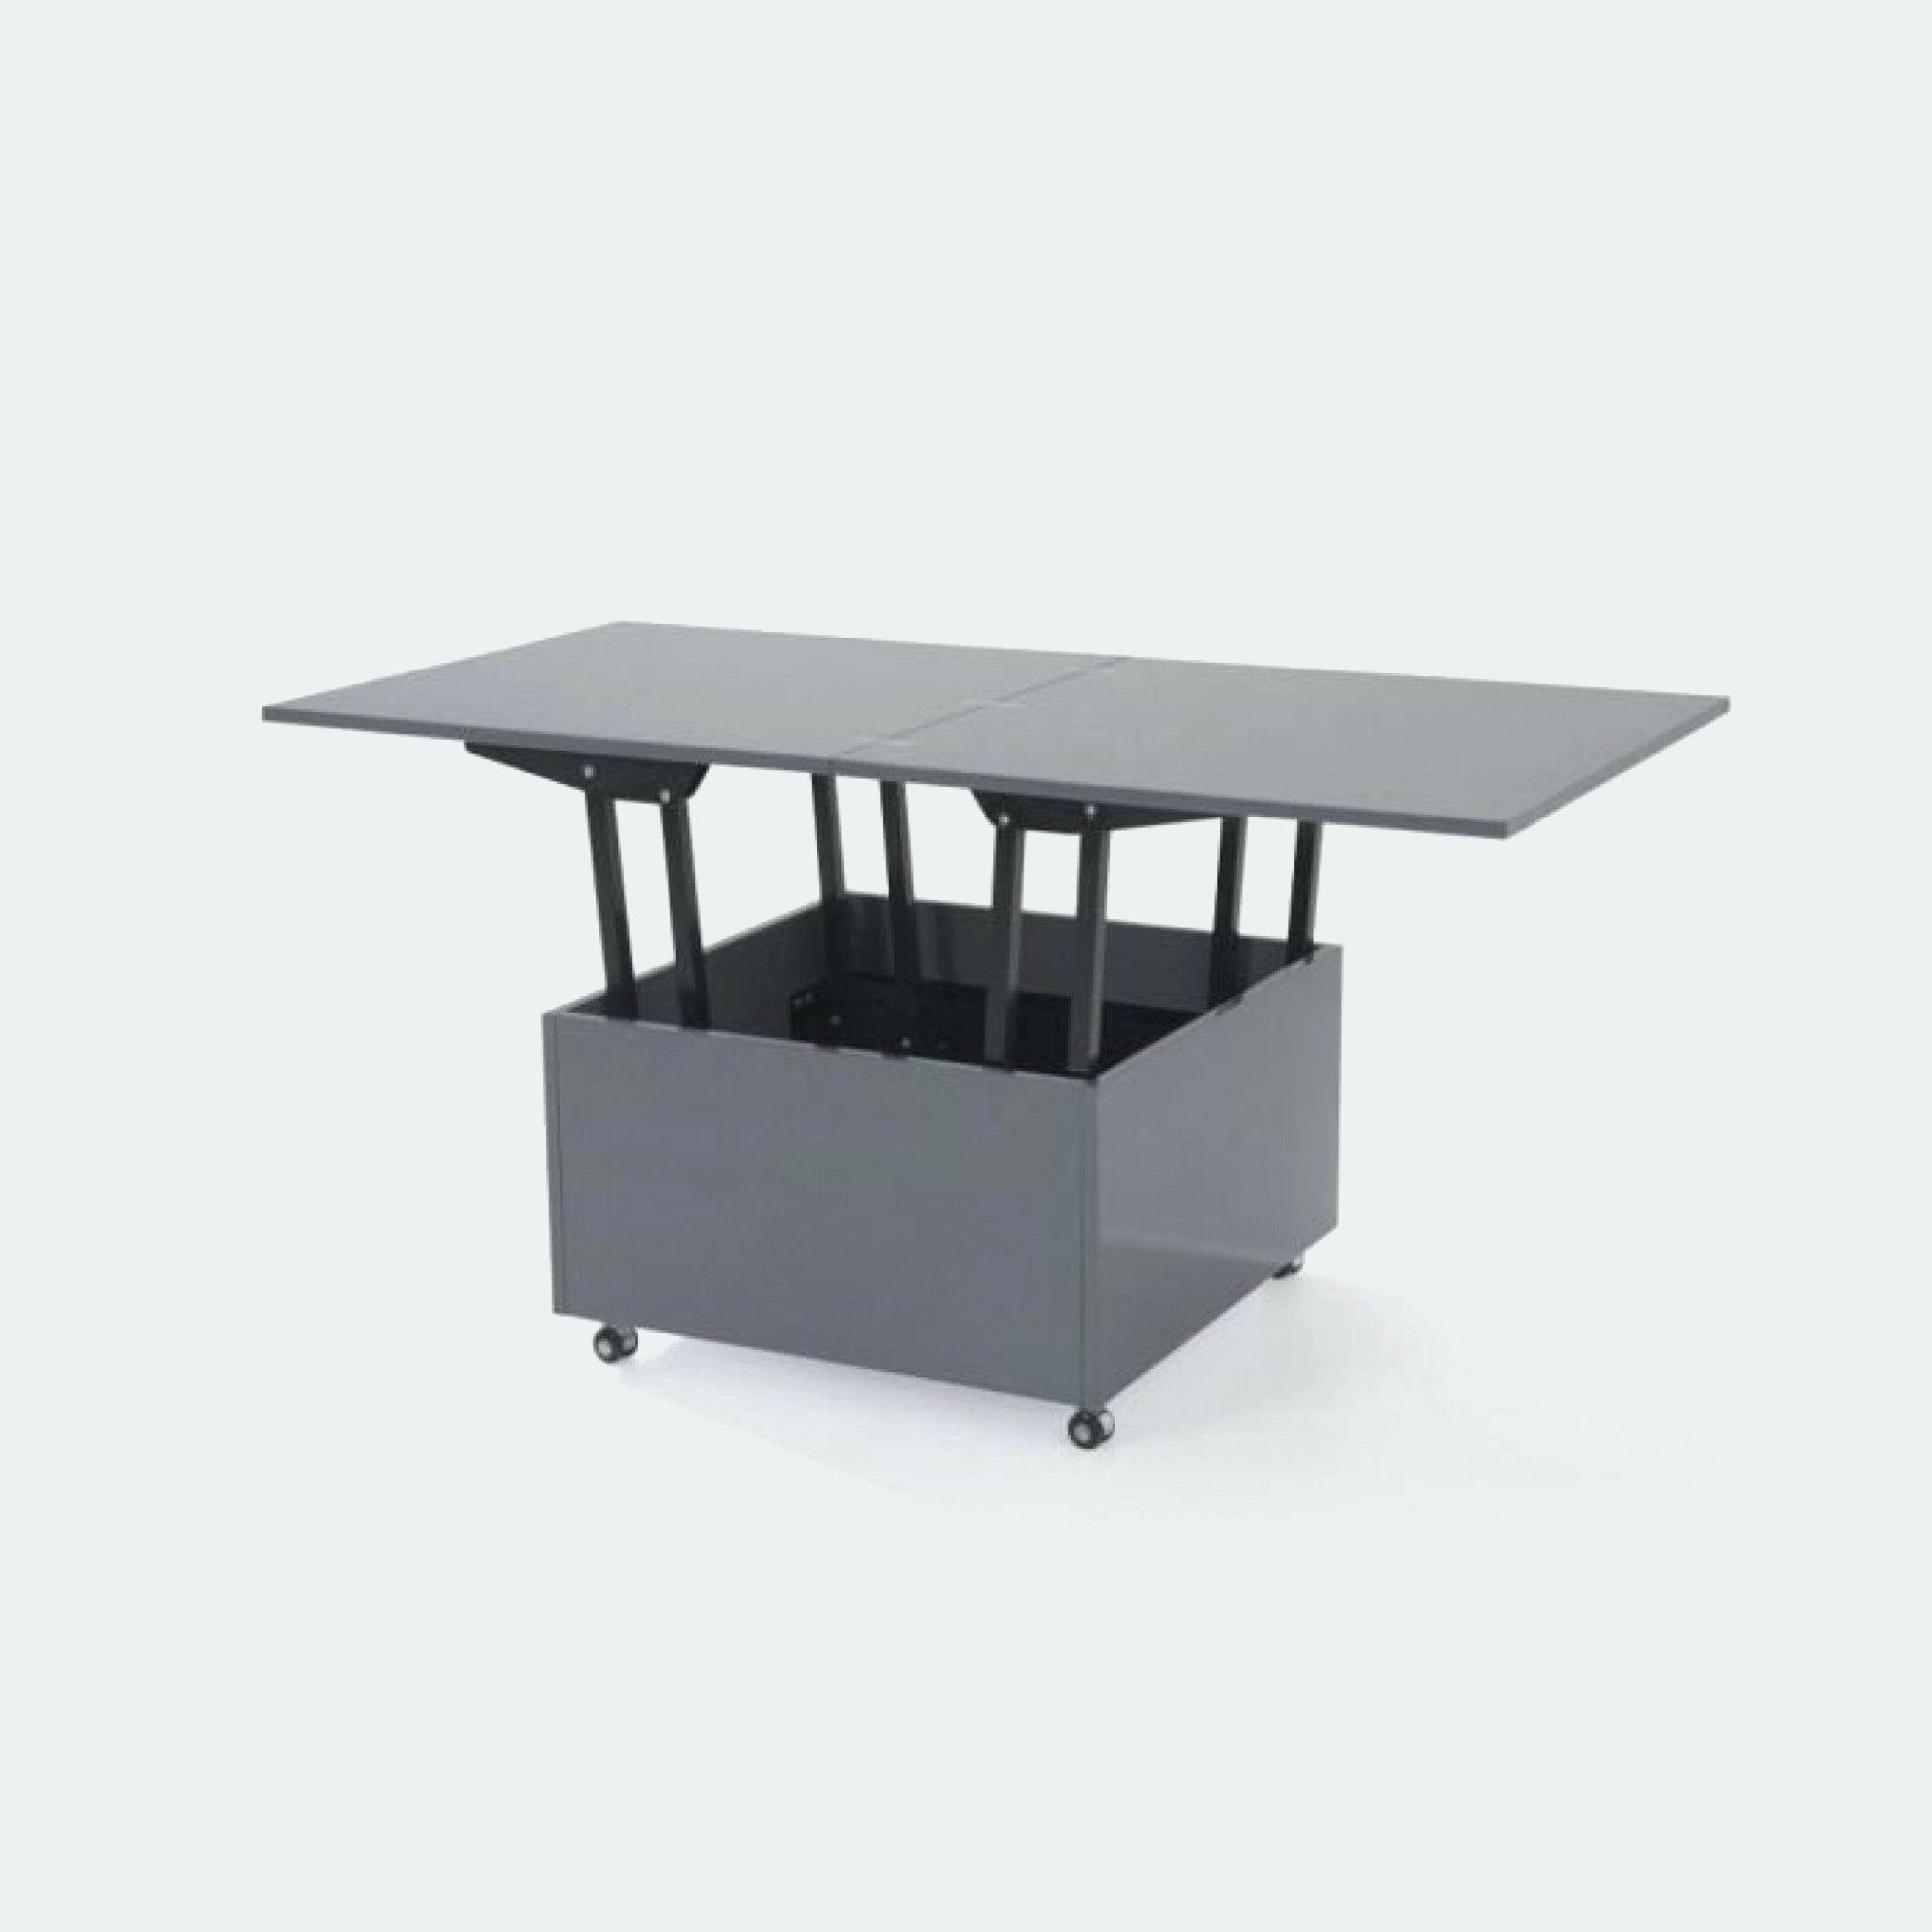 Table Kettler solde Inspirant Photos Table Pliable Pas Cher Best Table En Bois Jardin Luxe Beautiful Diy